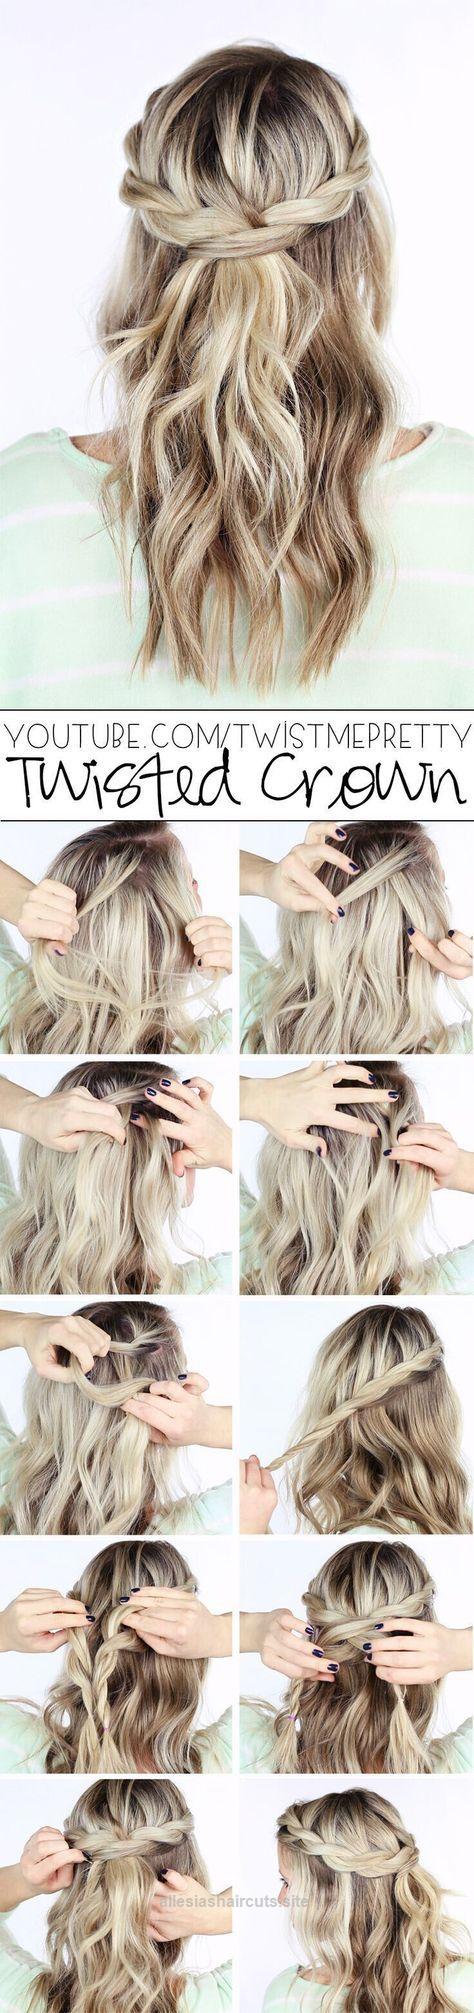 DIY Wedding Hairstyle  Twisted crown braid half up half down